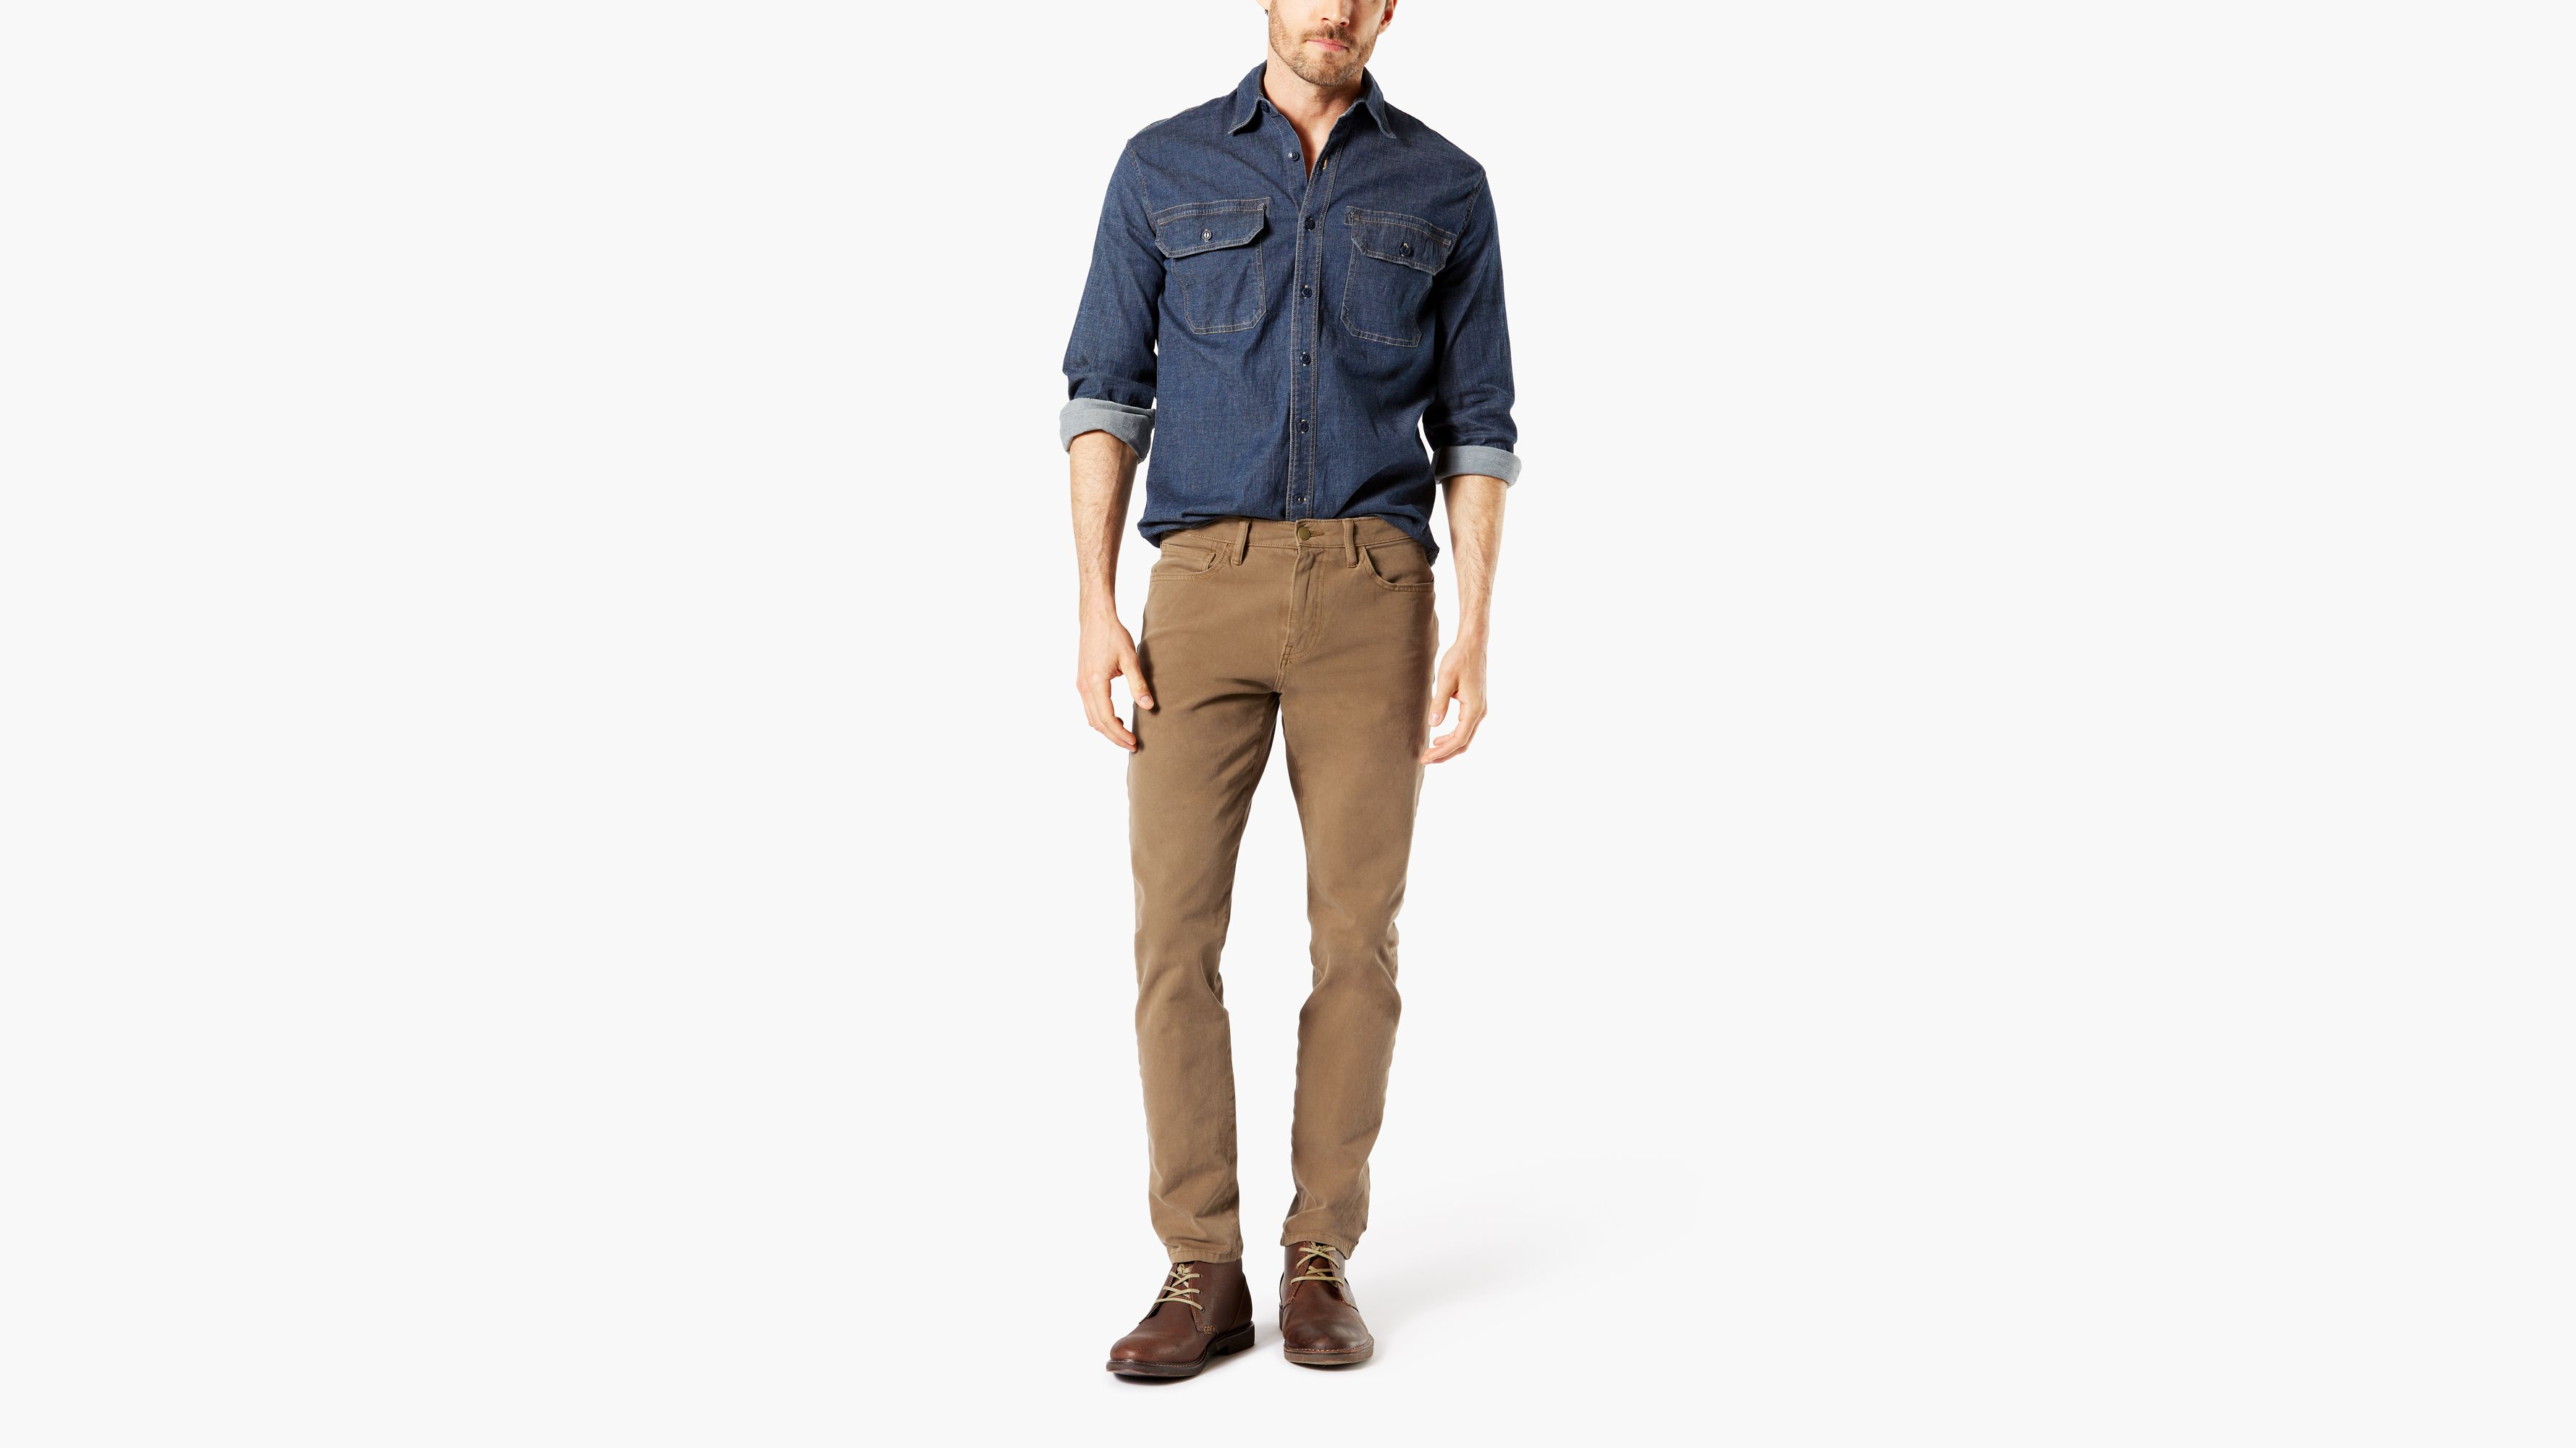 Dockers® Dockers® Novedades Novedades Pantalones Dockers® Hombre Pantalones Pantalones Hombre Hombre Es Es Novedades Twq0Zgd1